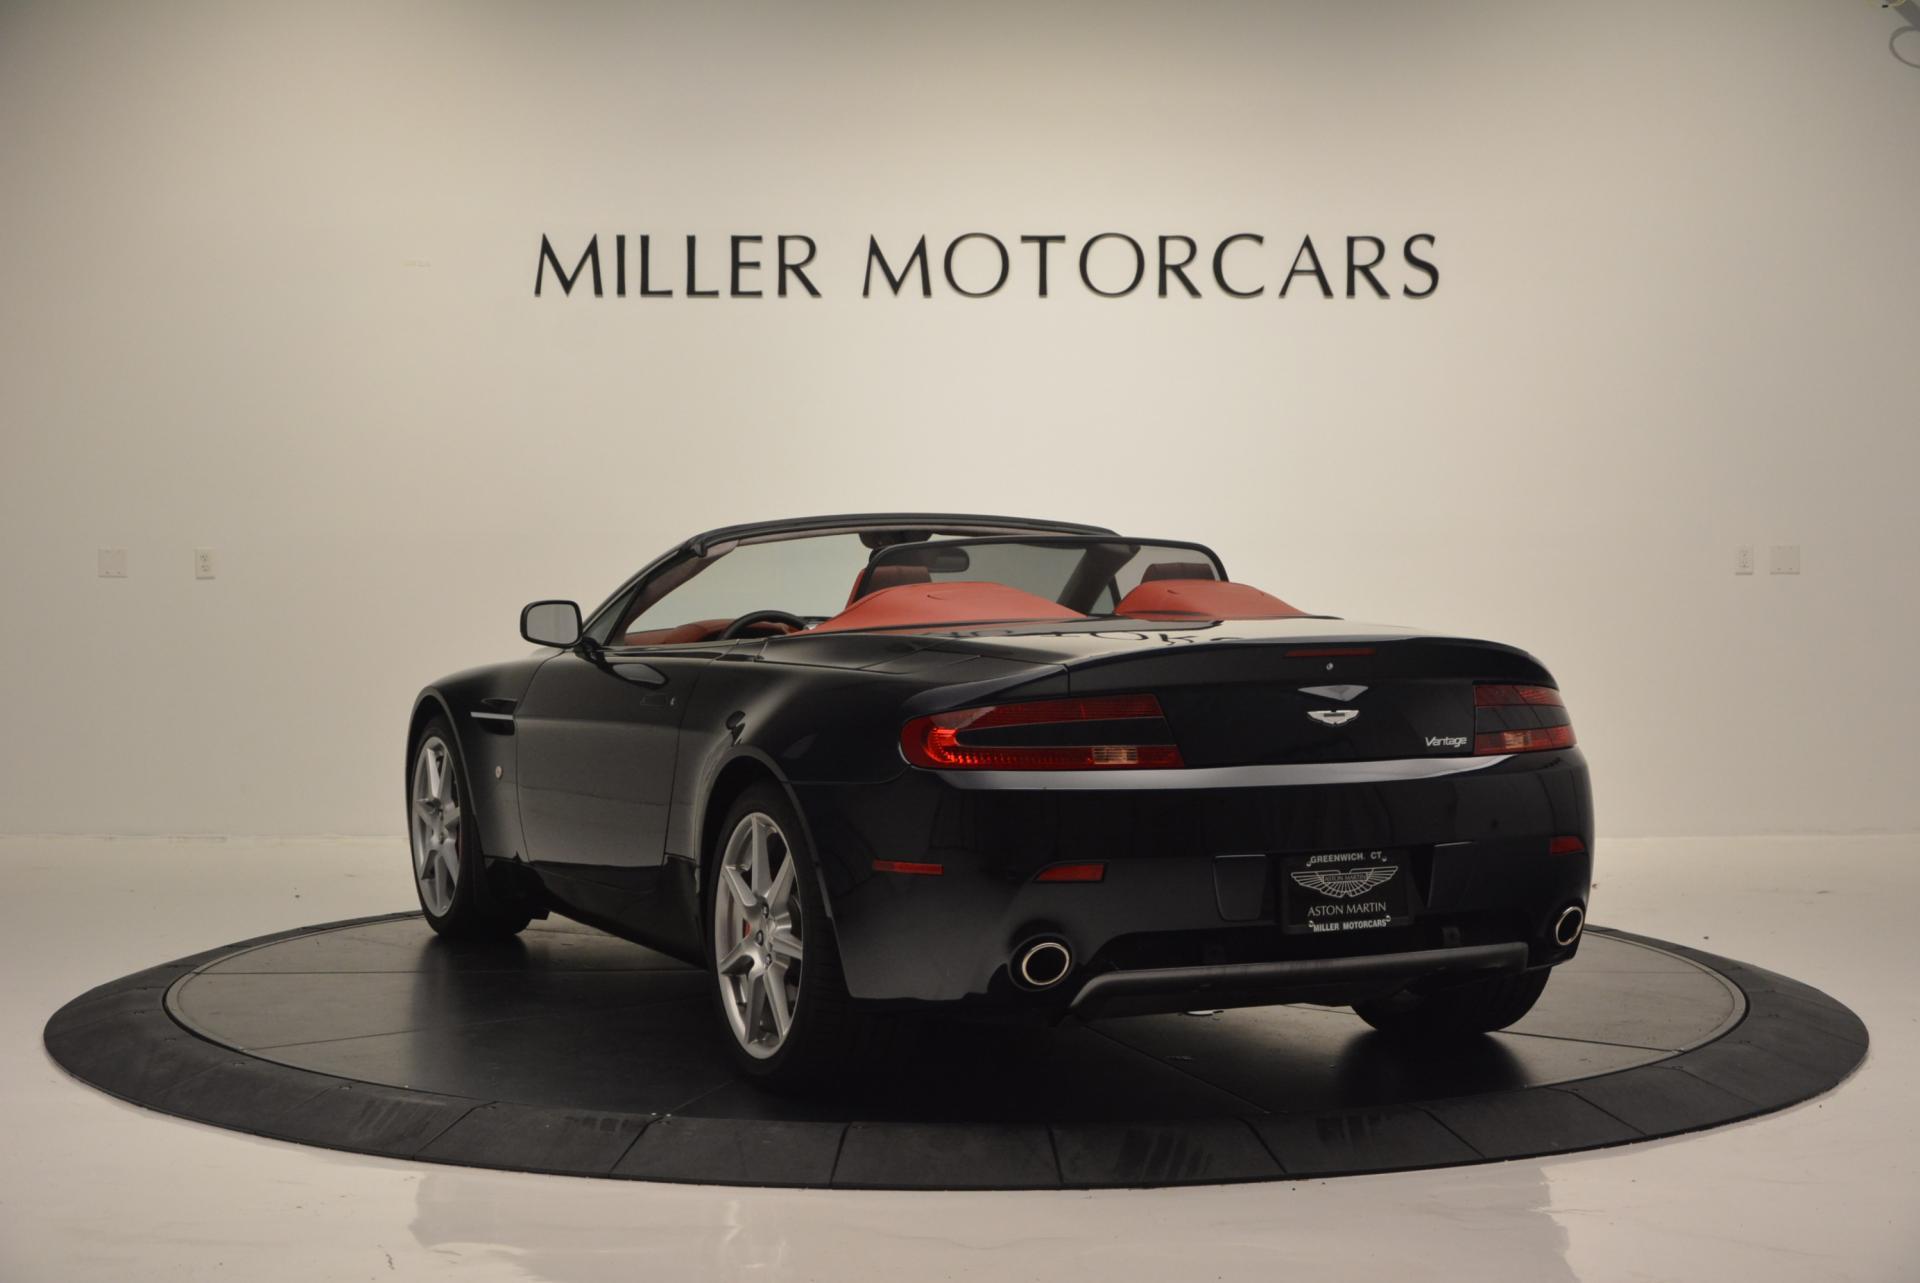 2008 Aston Martin V8 Vantage Roadster Stock # 7038 for sale